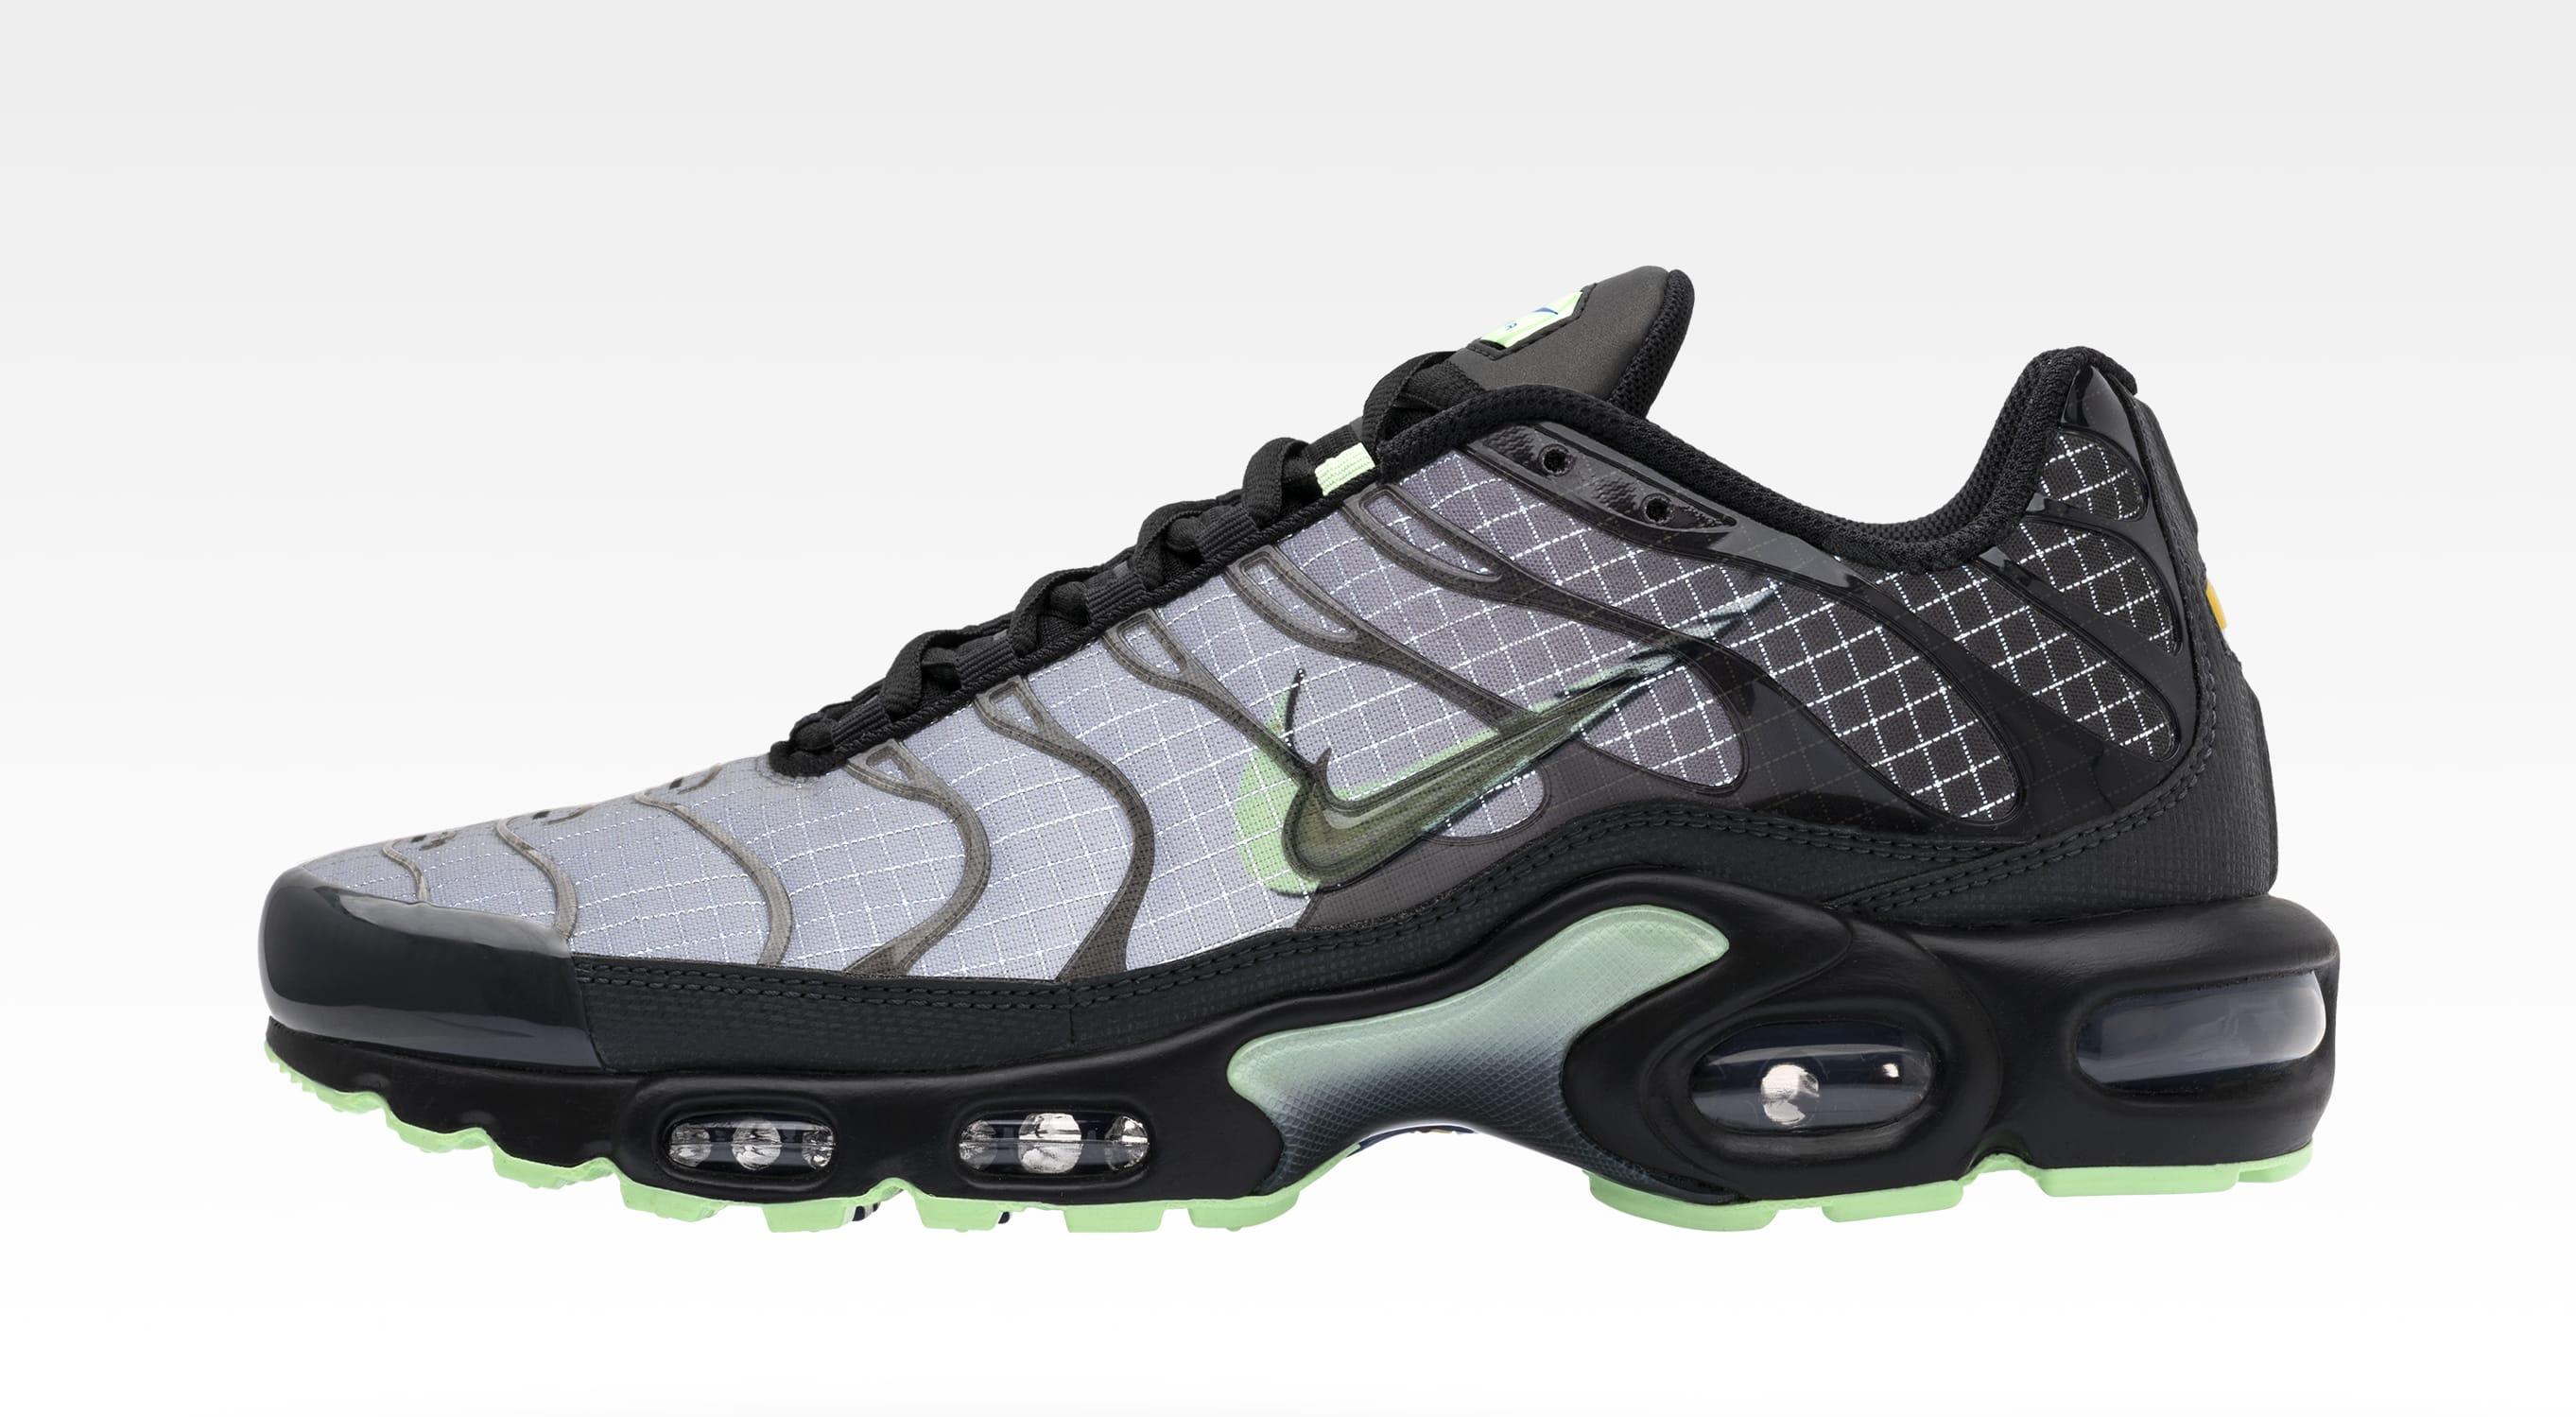 Hazlo pesado Coro pelota  Foot Locker x Nike 'Future Swoosh' Collection Release Date | Sole Collector